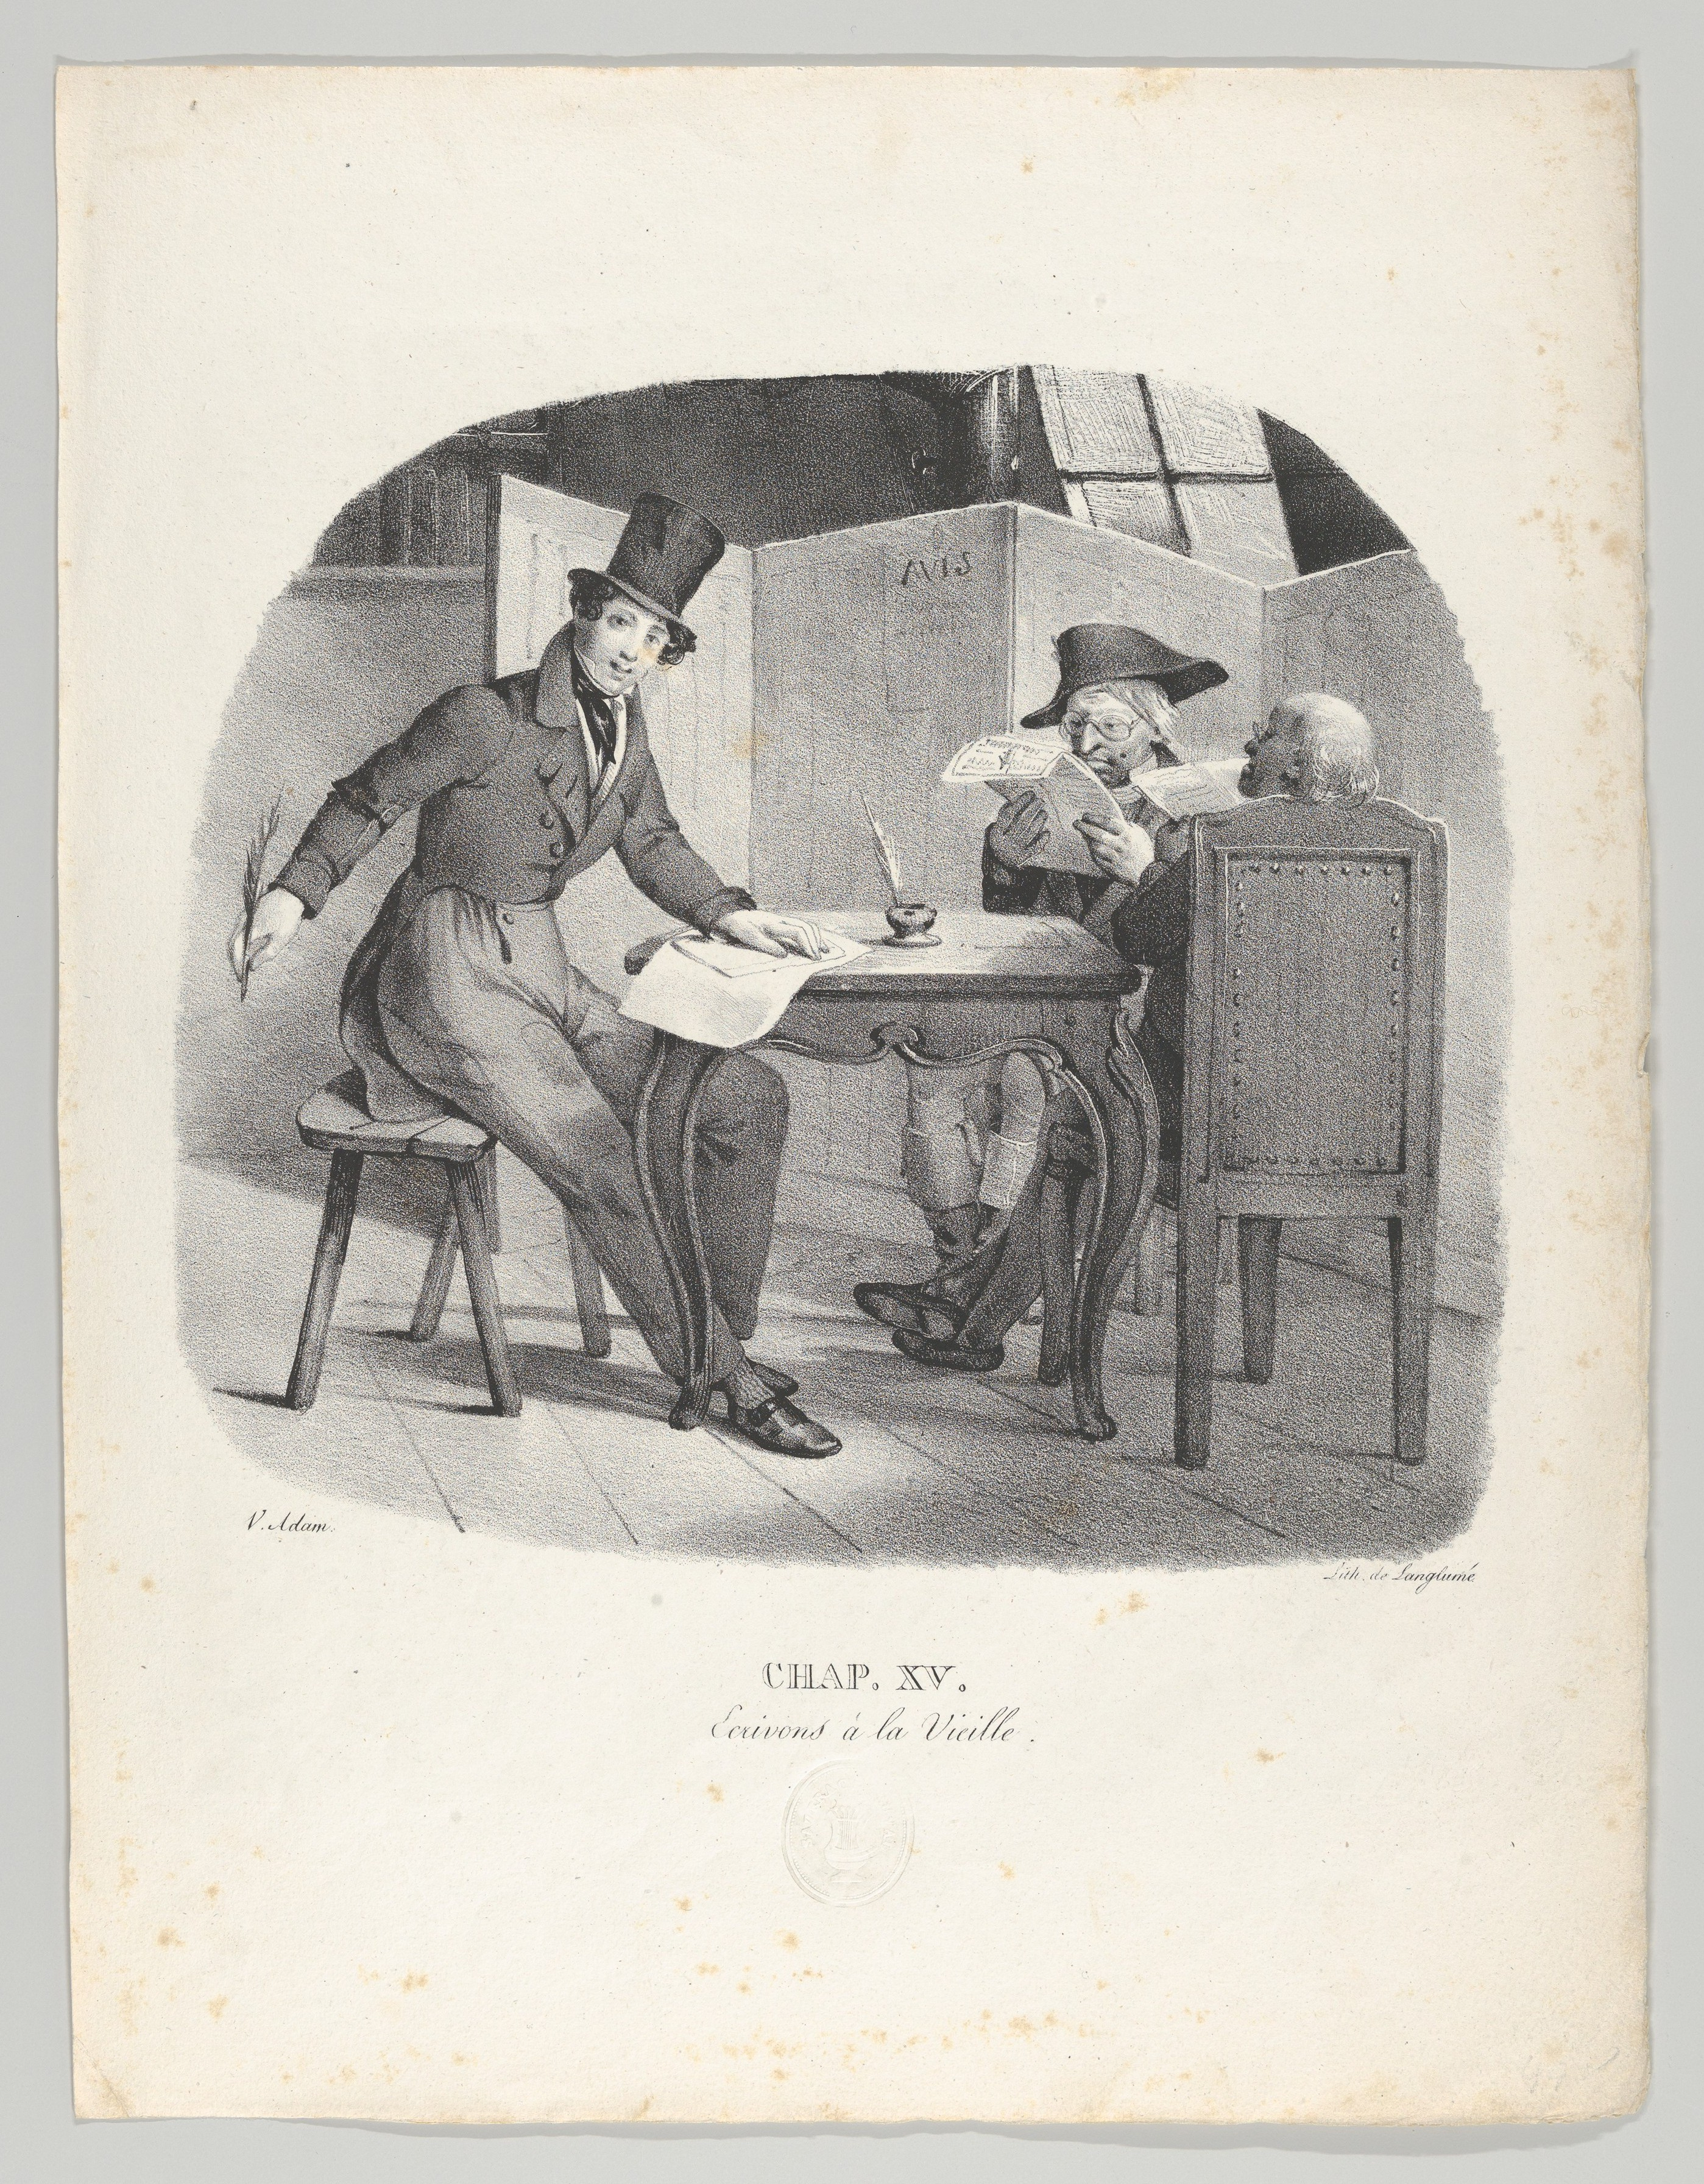 Rencontre Coquine Vers Annecy Avec Une Coquine Bandante